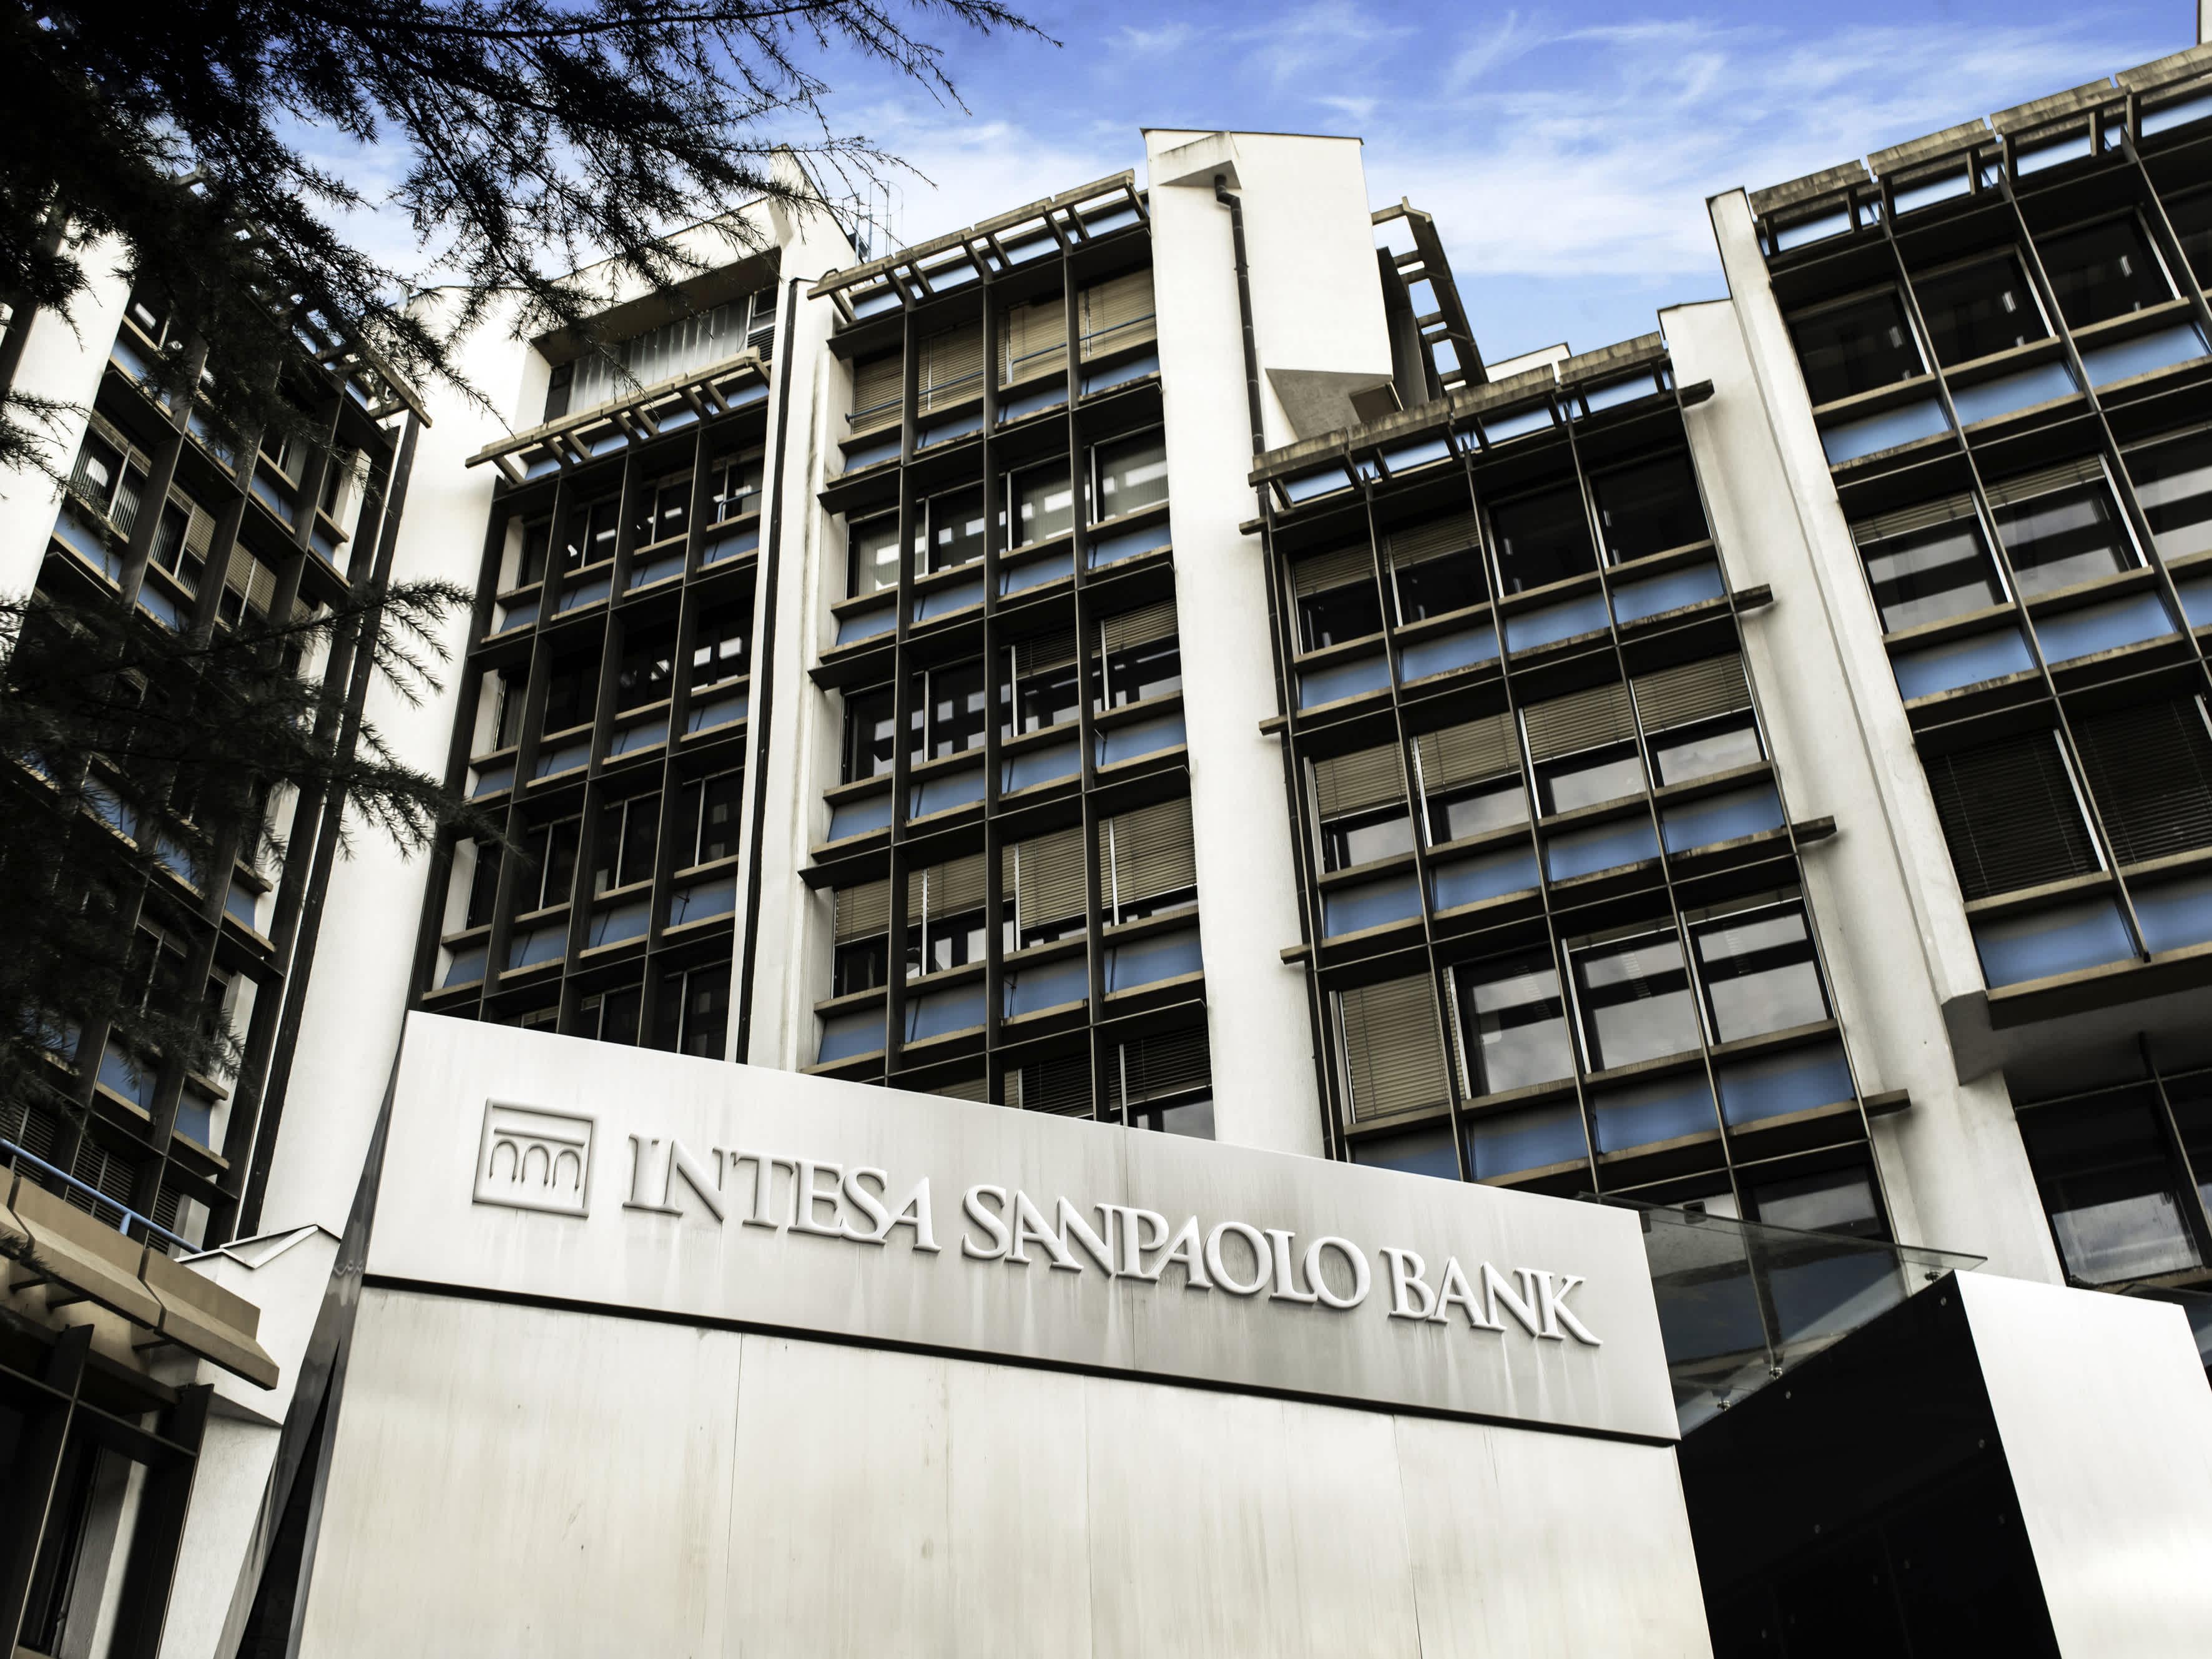 Bank's headquarter